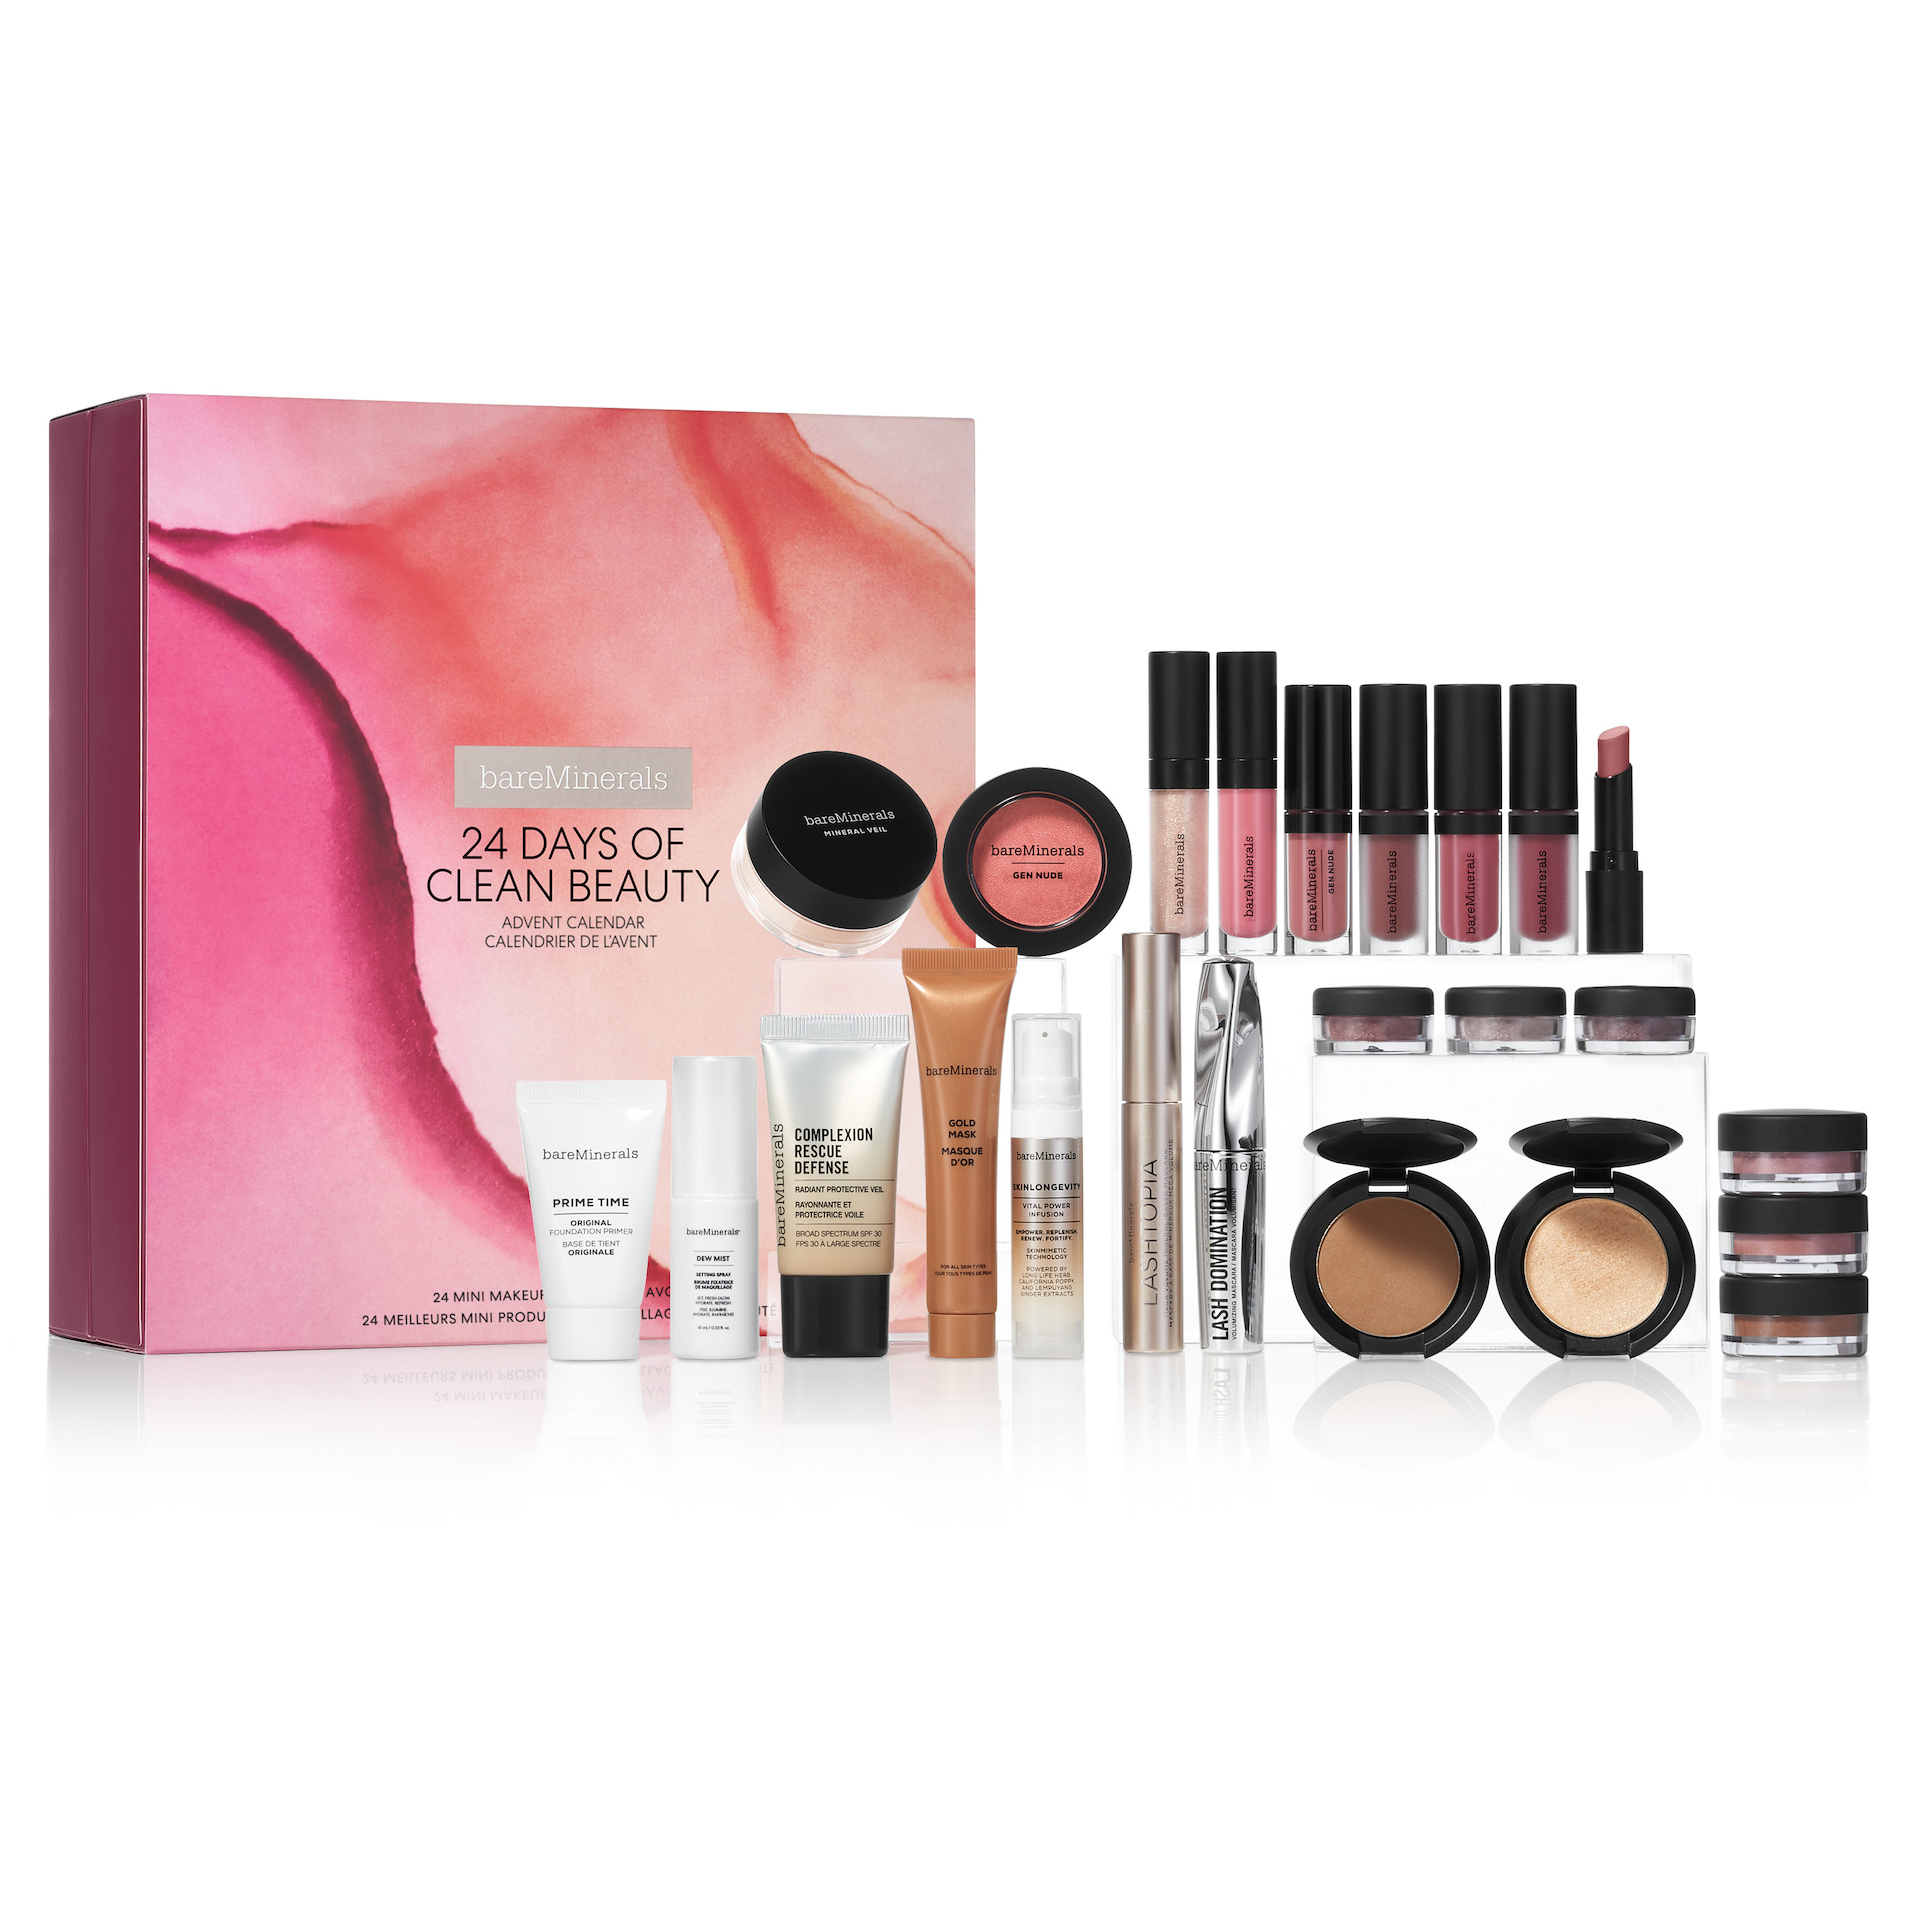 Bilde av 24 Days Of Clean Beauty Advent Calendar